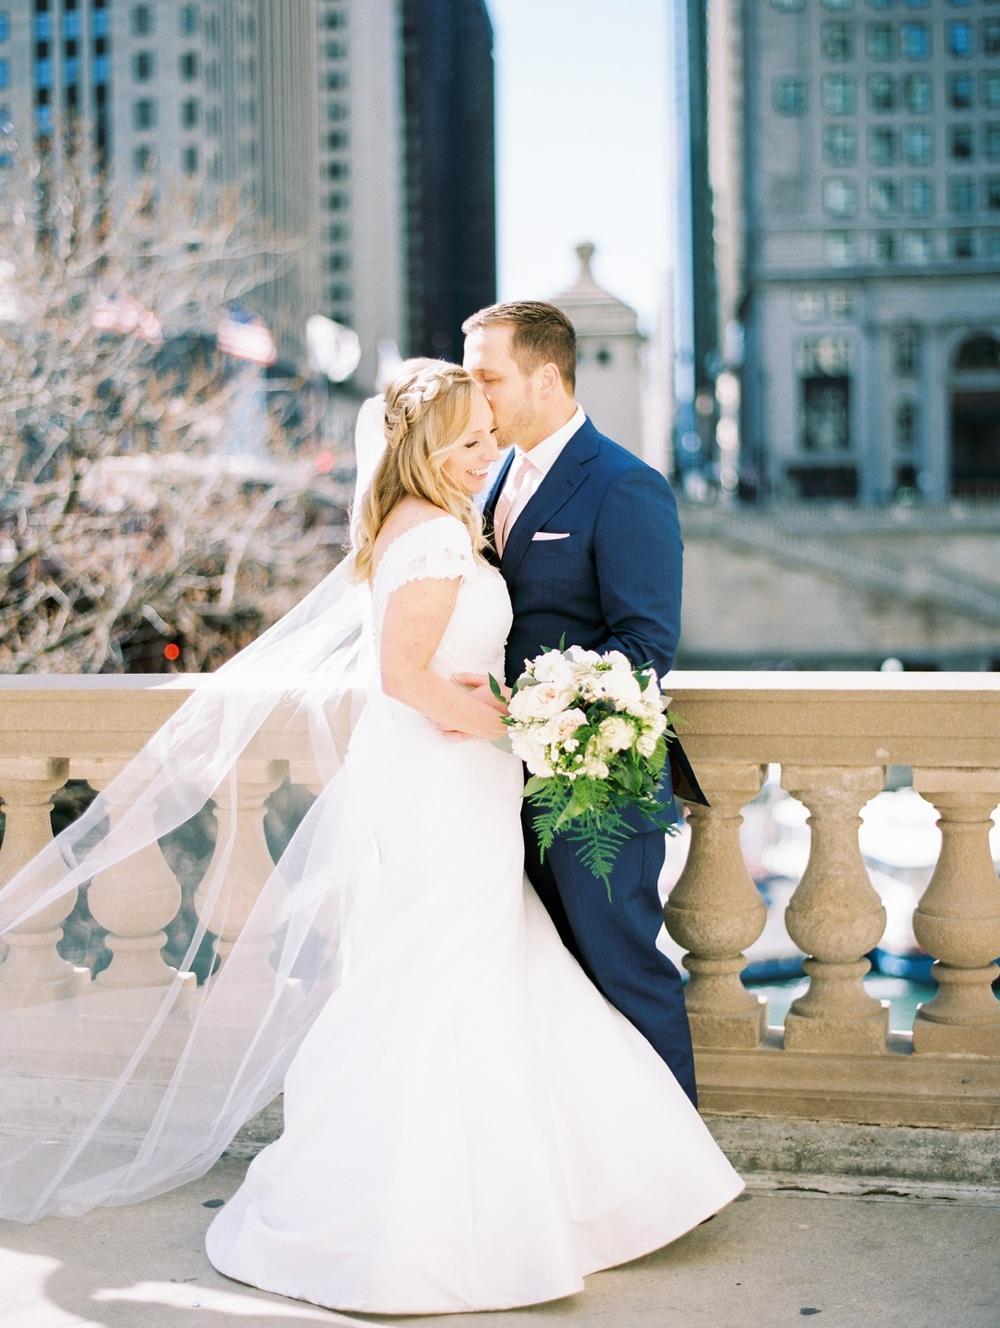 kristin-la-voie-photography-Cafe-Brauer-Chicago-Wedding-Photographer-93